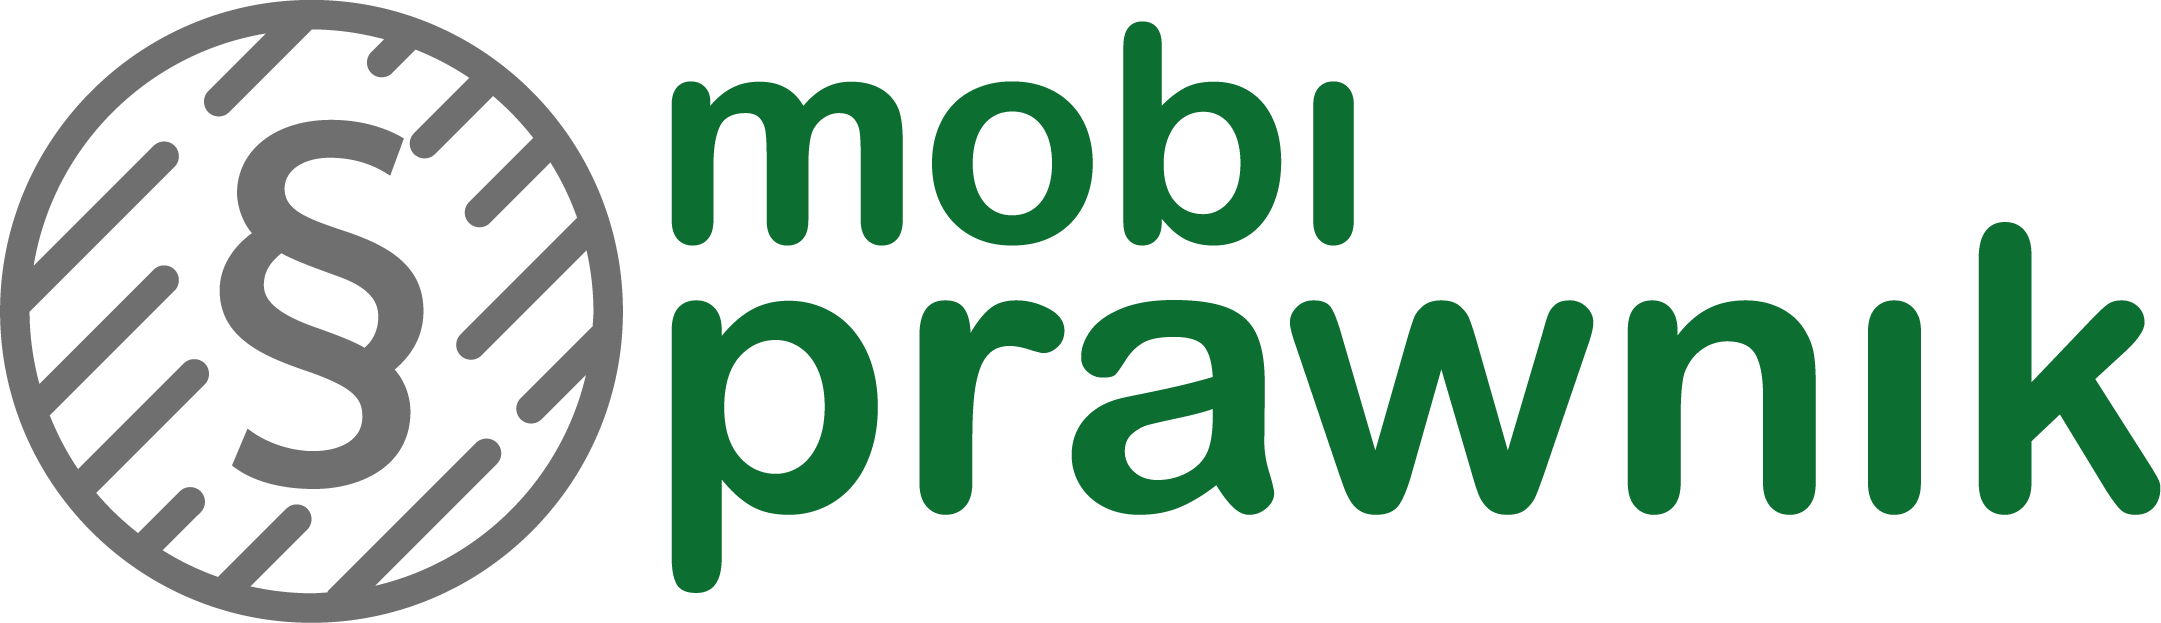 Mobi-prawnik.pl